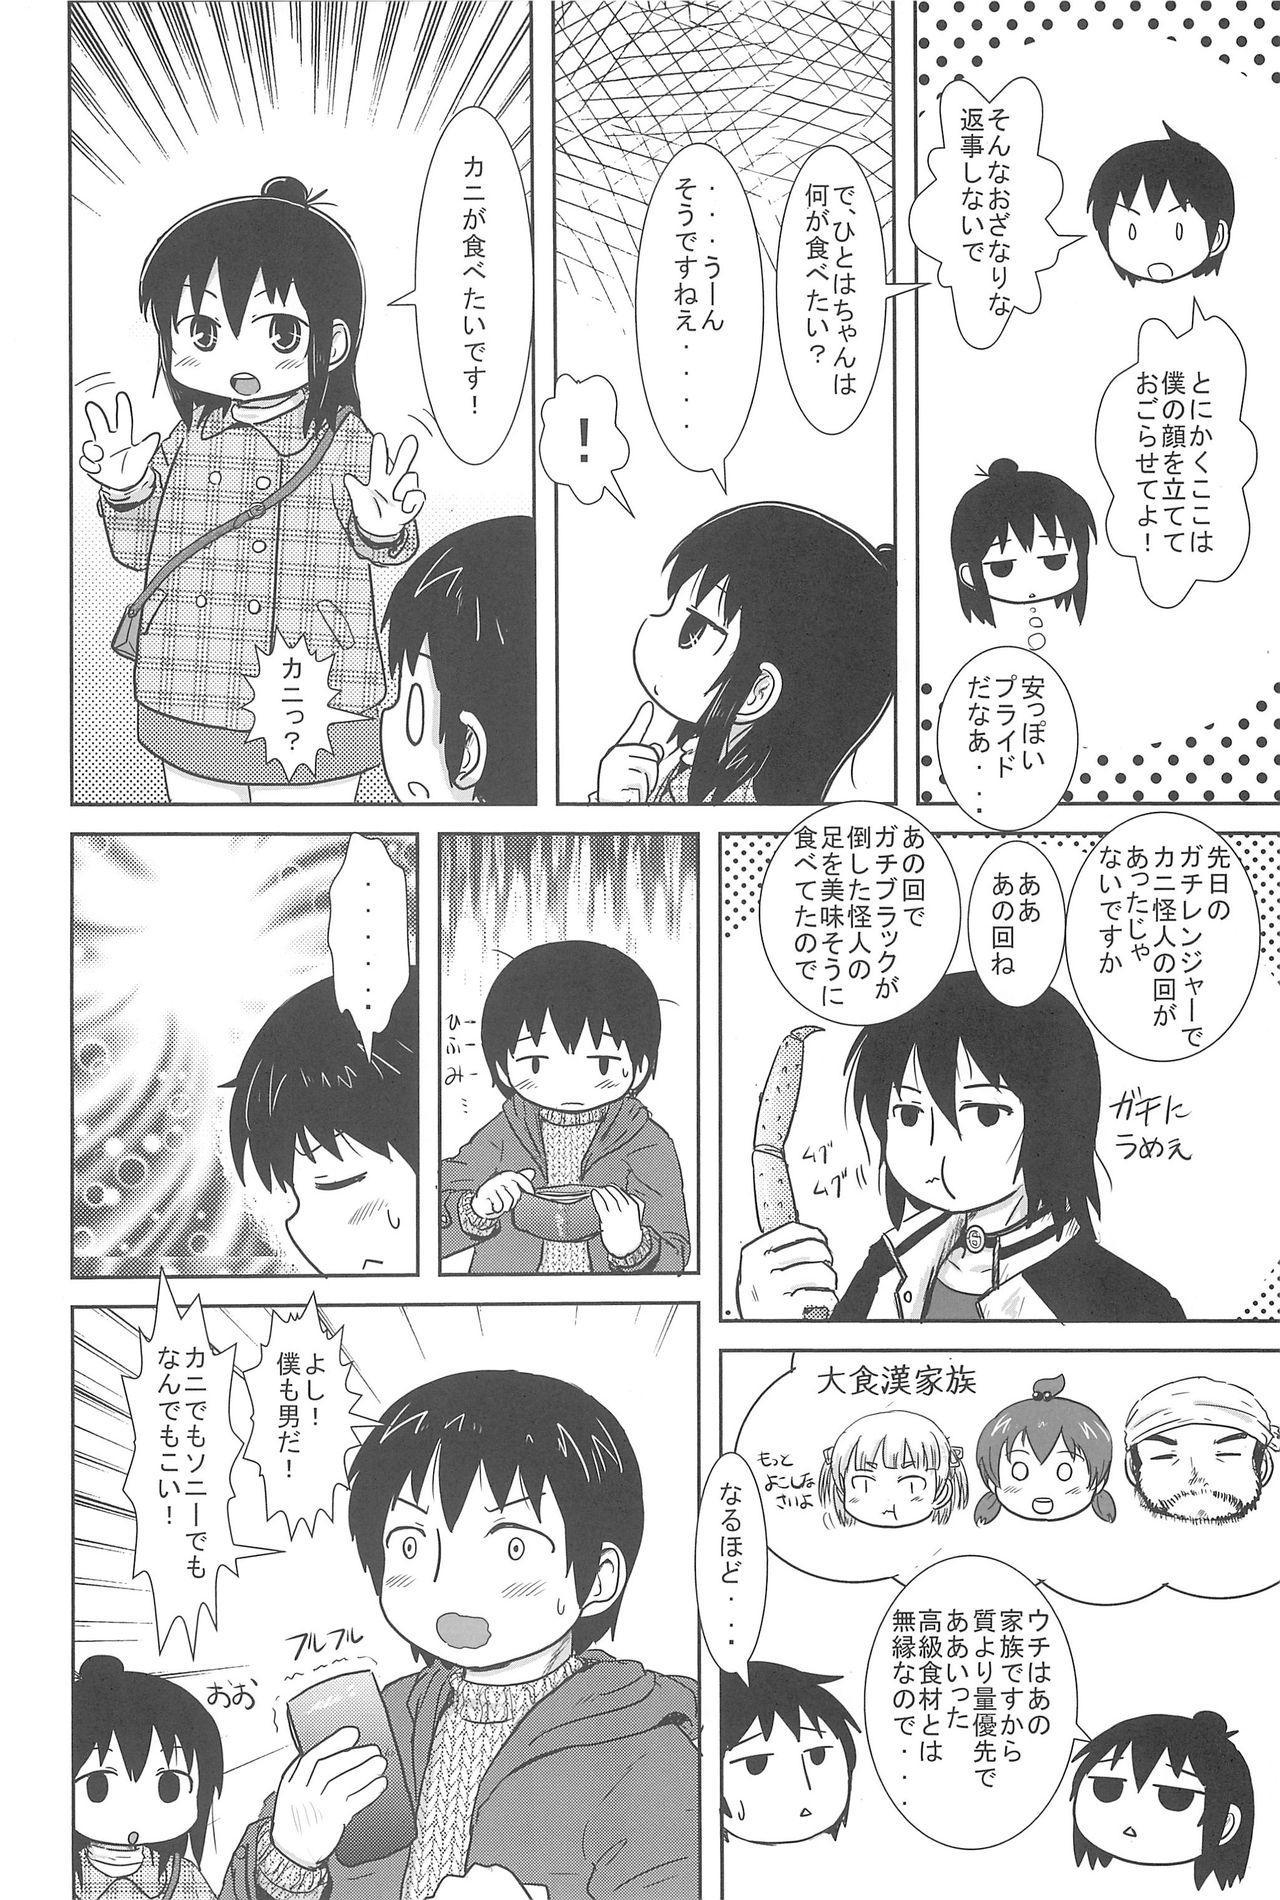 Futari de Oishiku 3